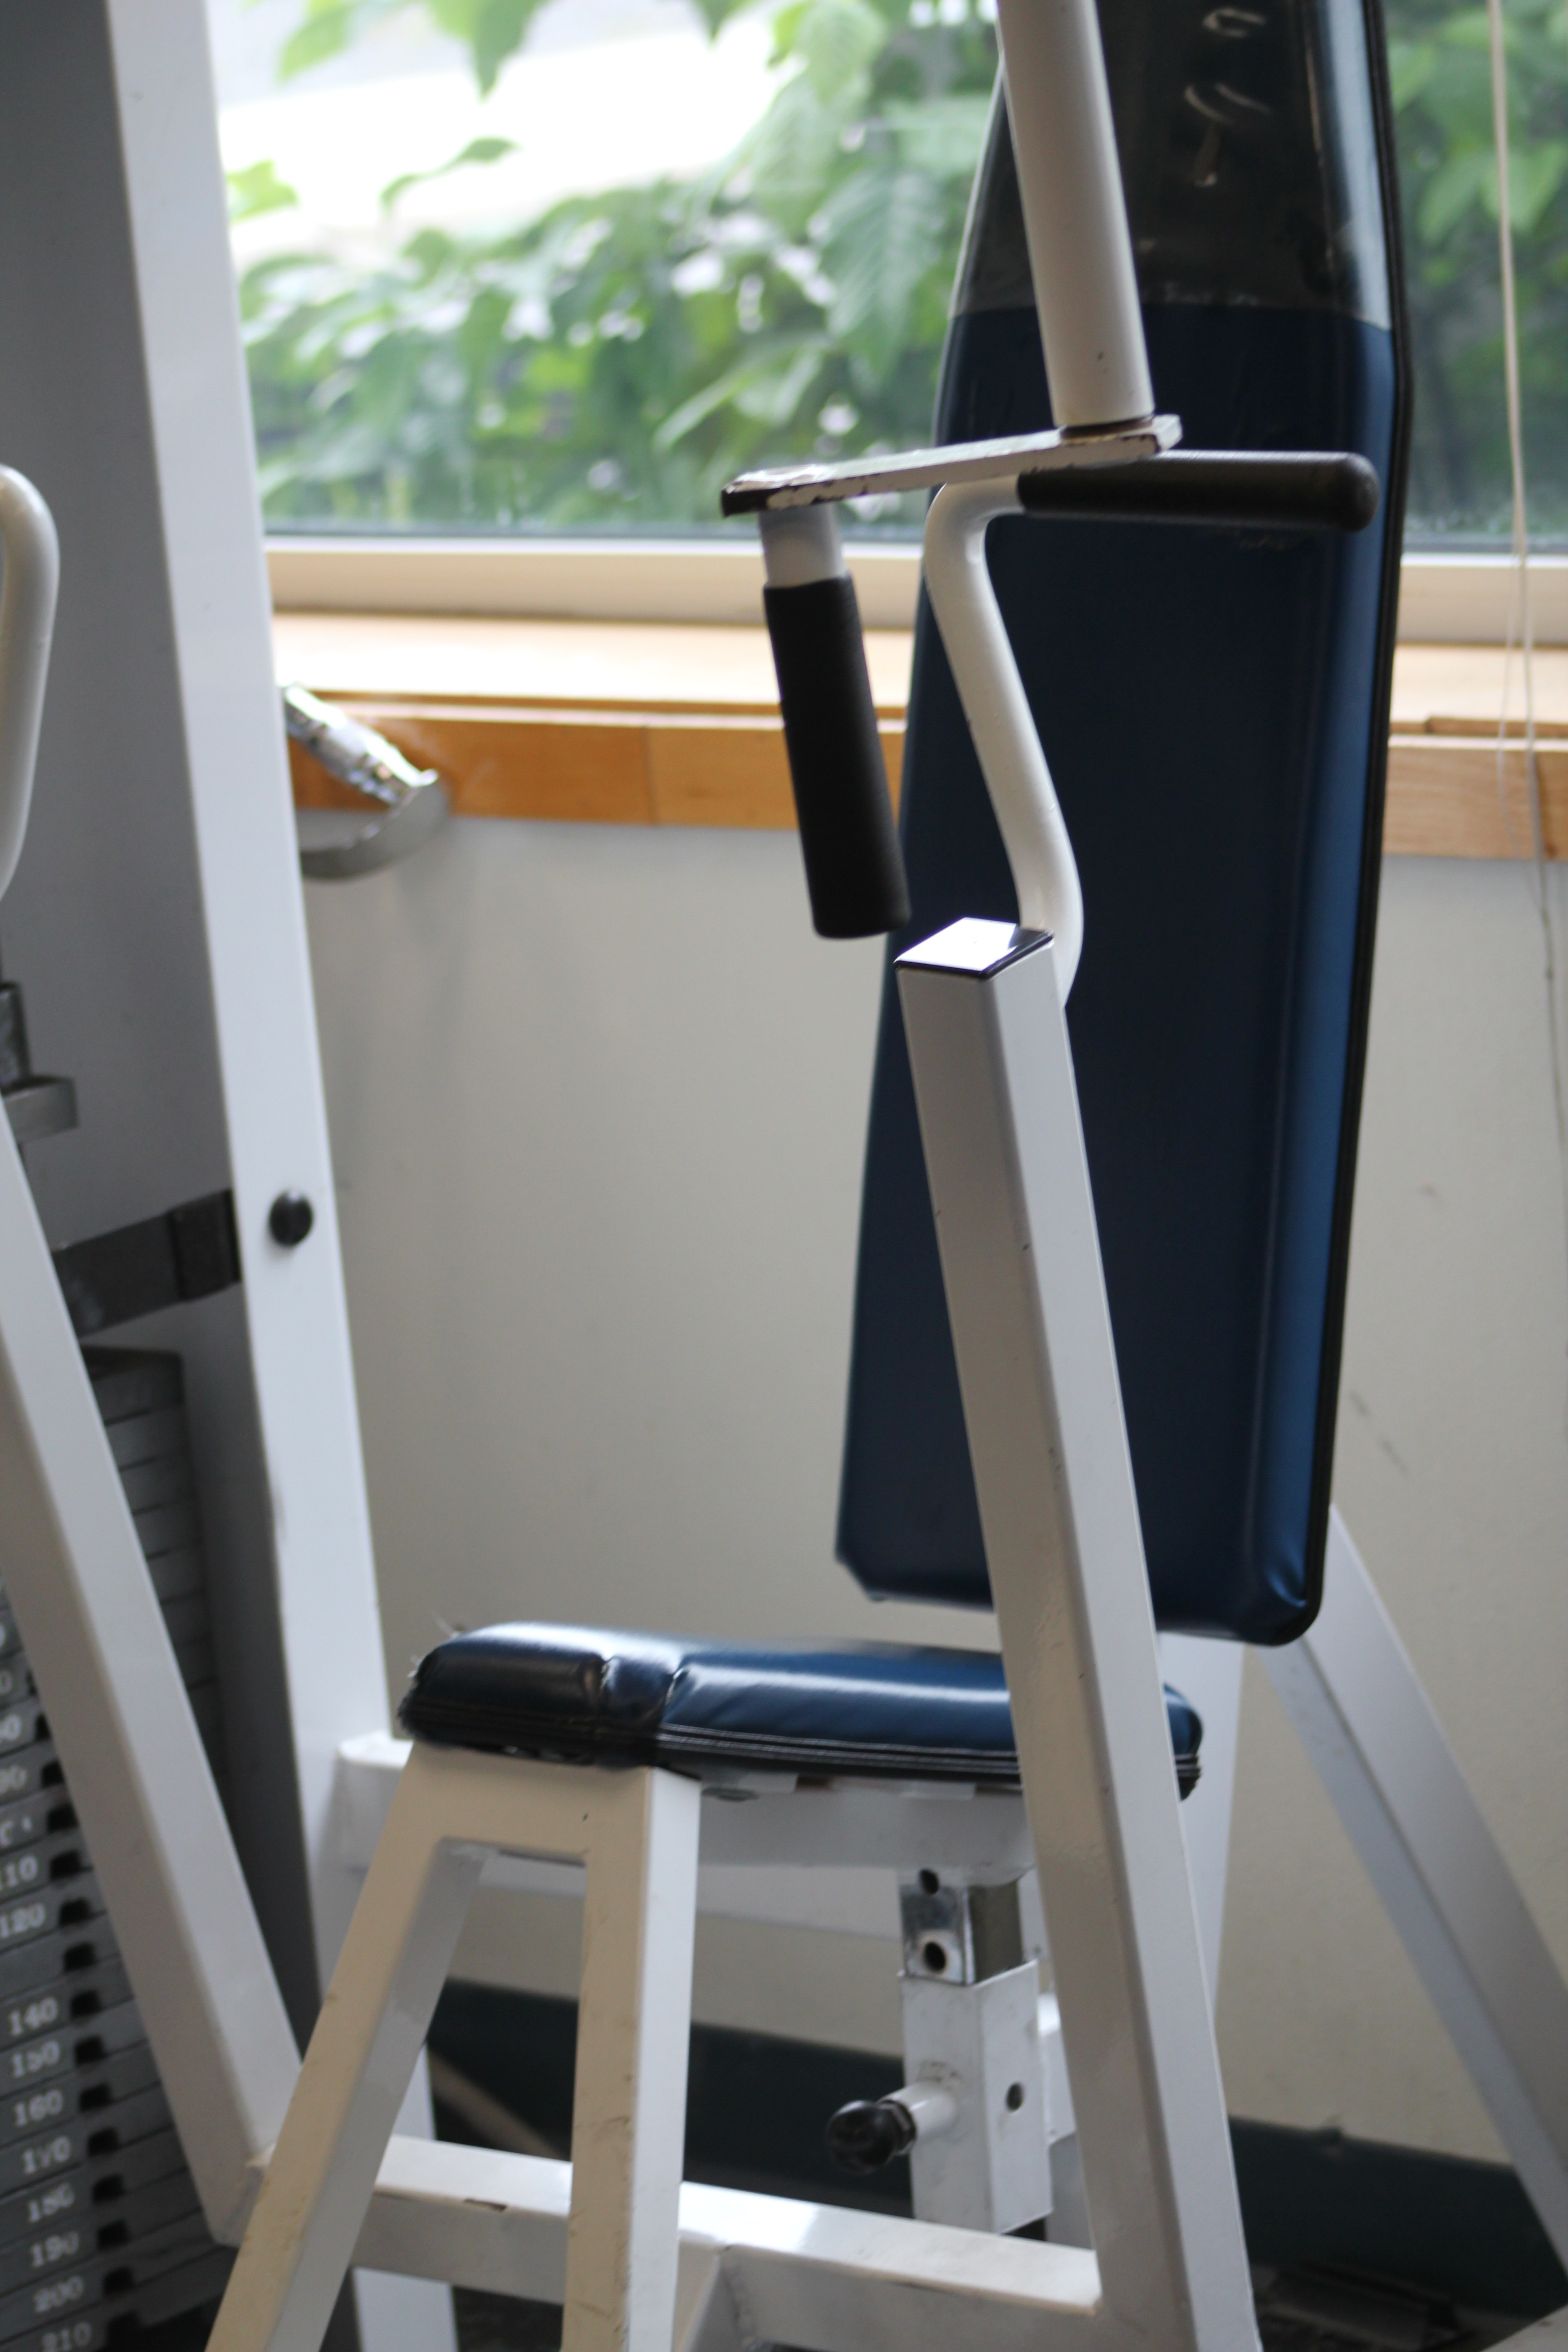 Recreation renovating fitness center through summer